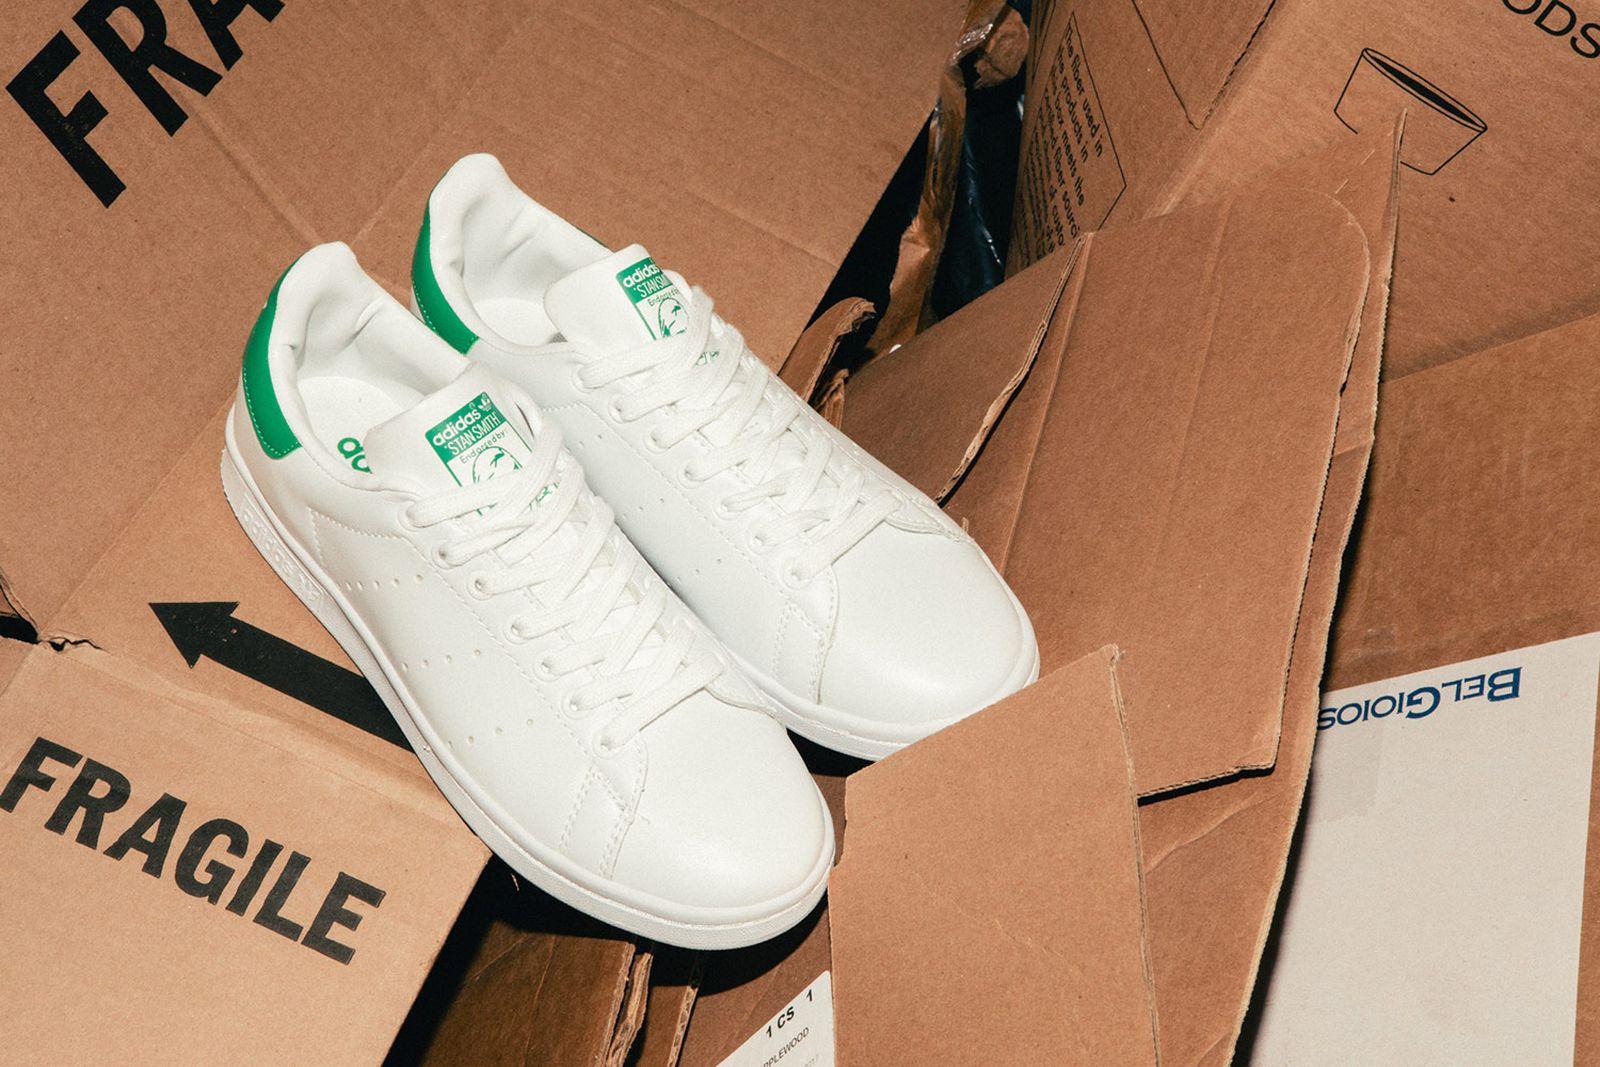 Legit-Check-Fake-Sneakers-Highsnobiety-12